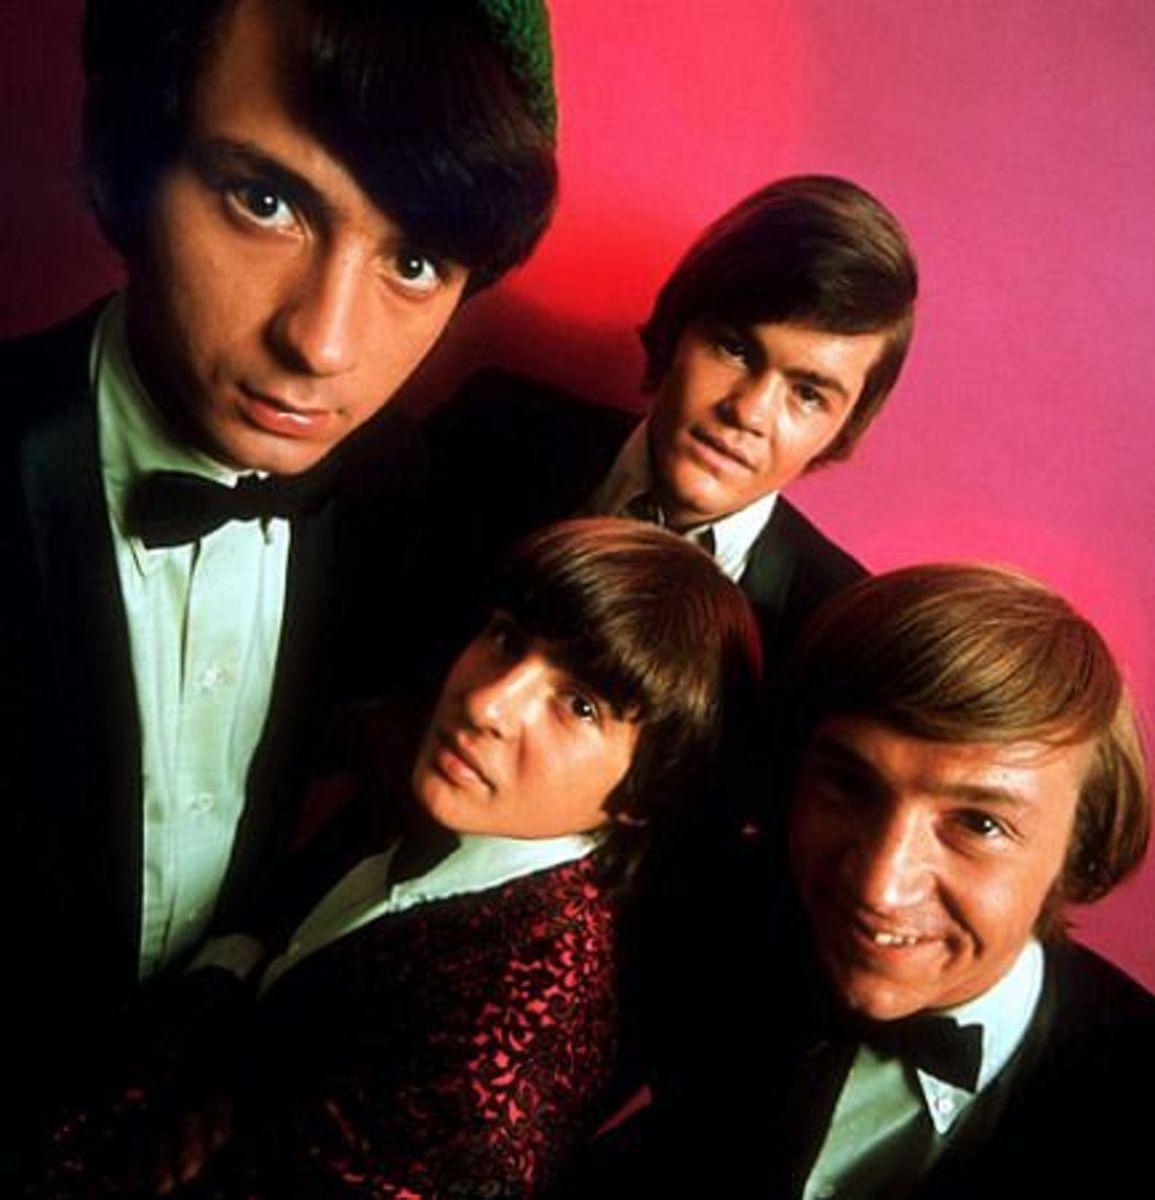 Monkees publicity photo